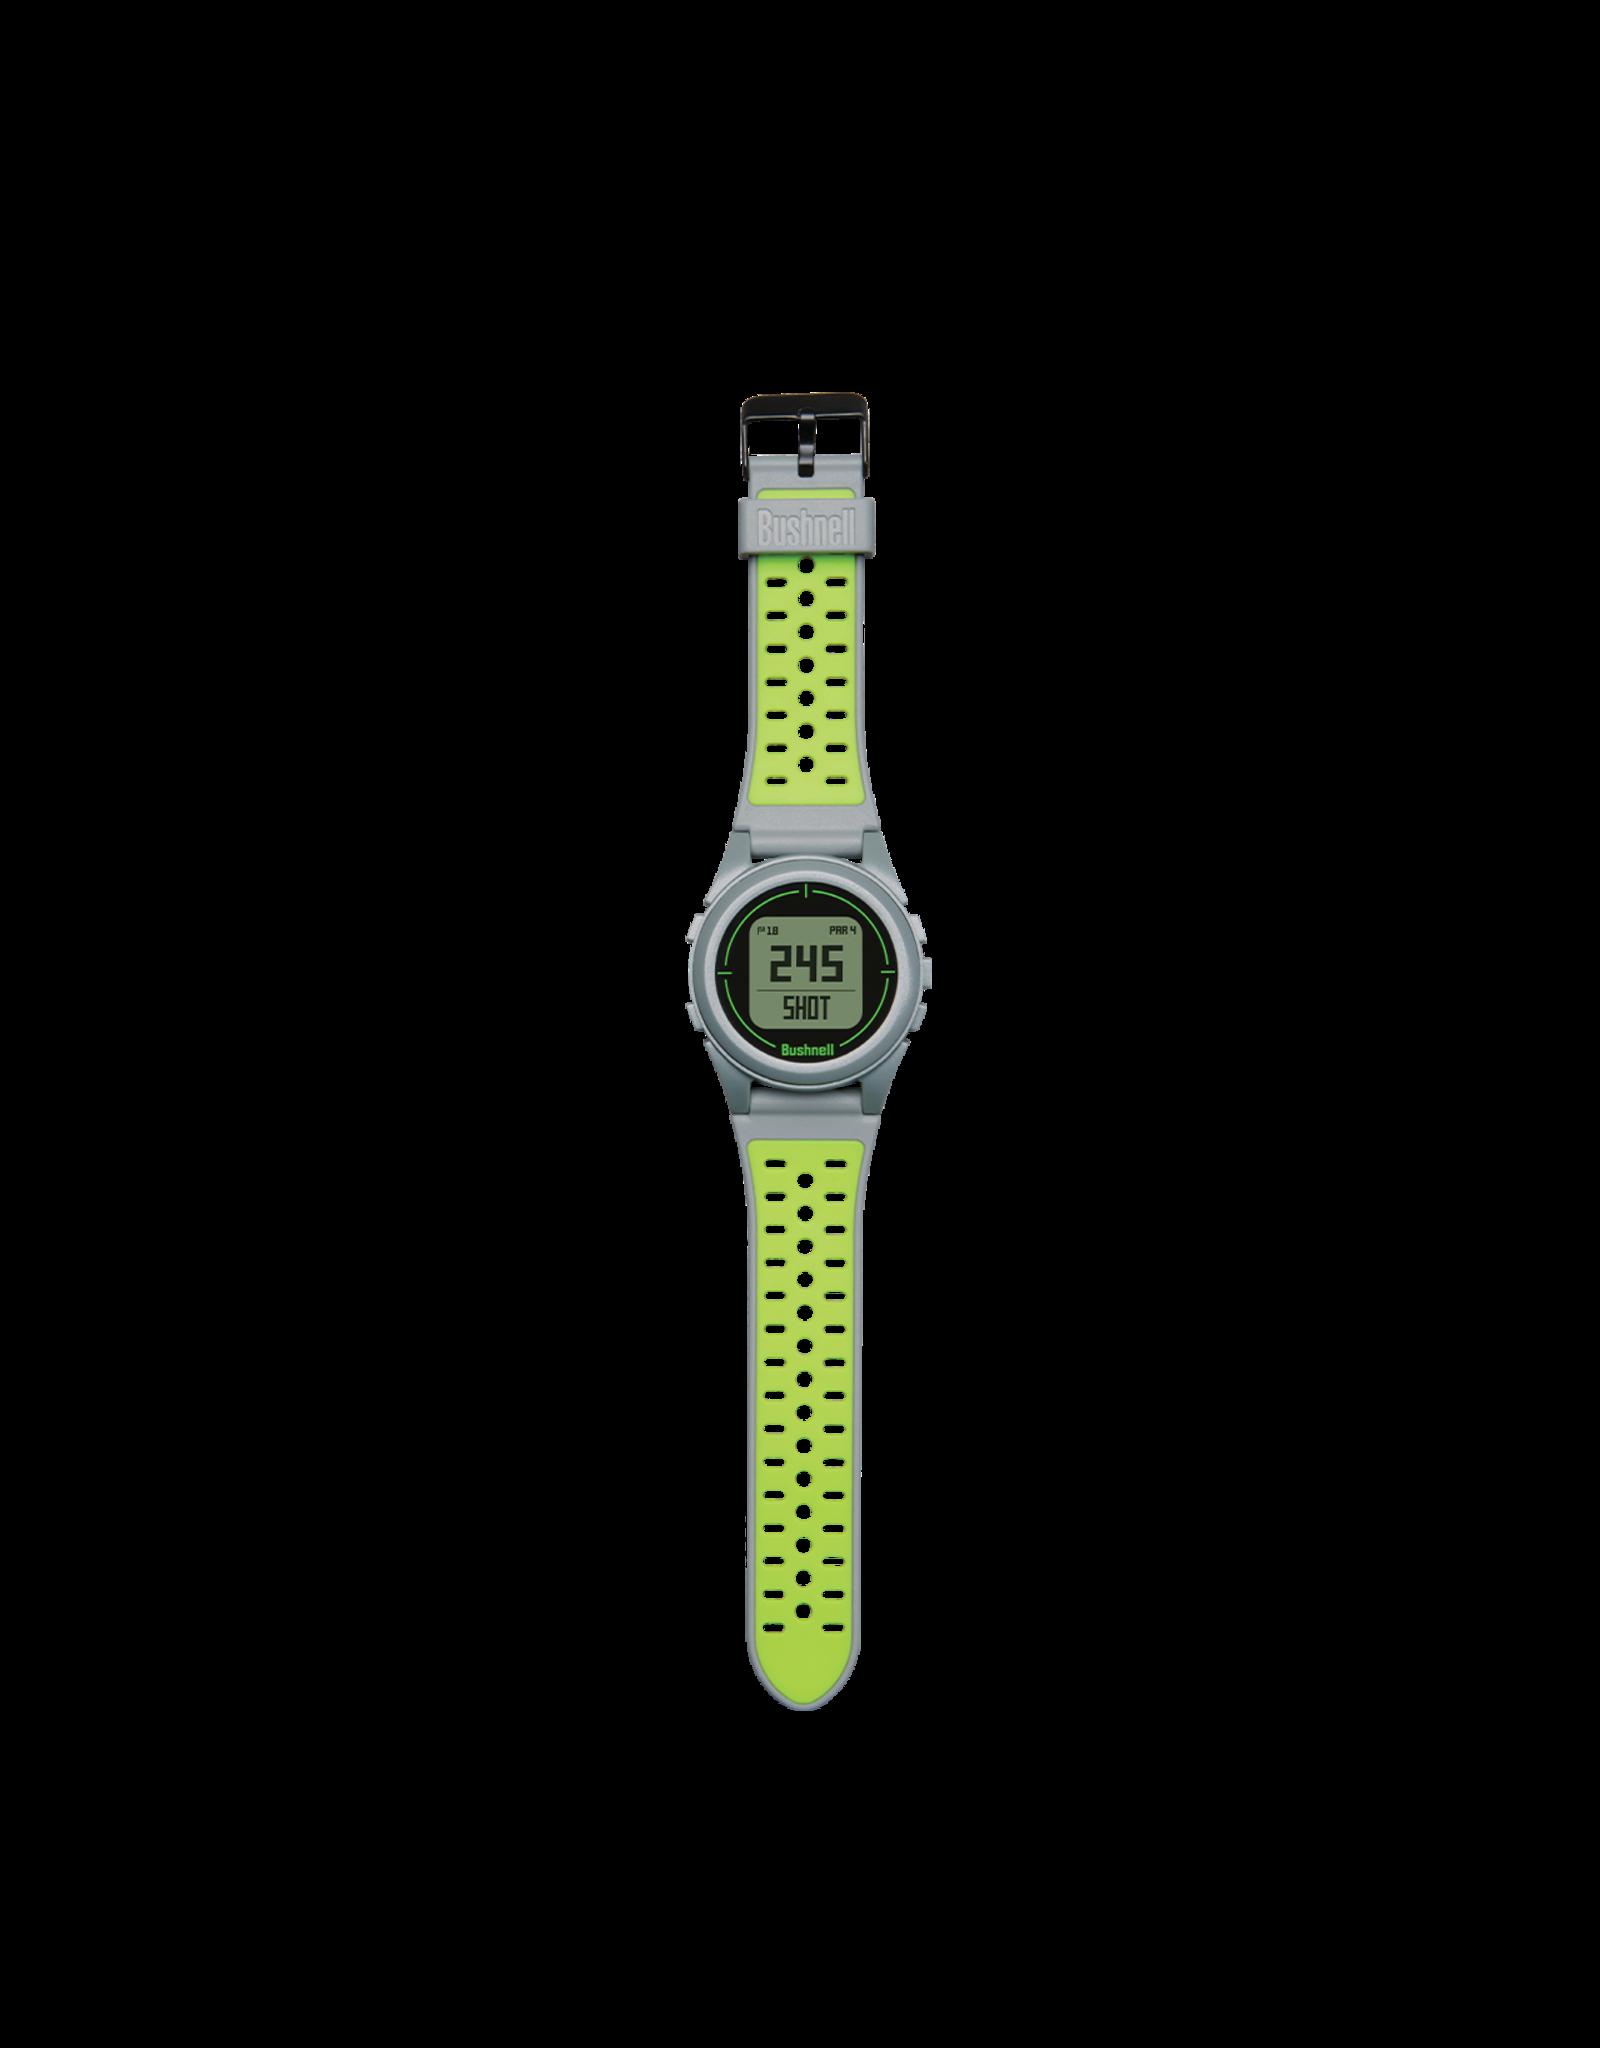 Bushnell Bushnell GPS watch iON2